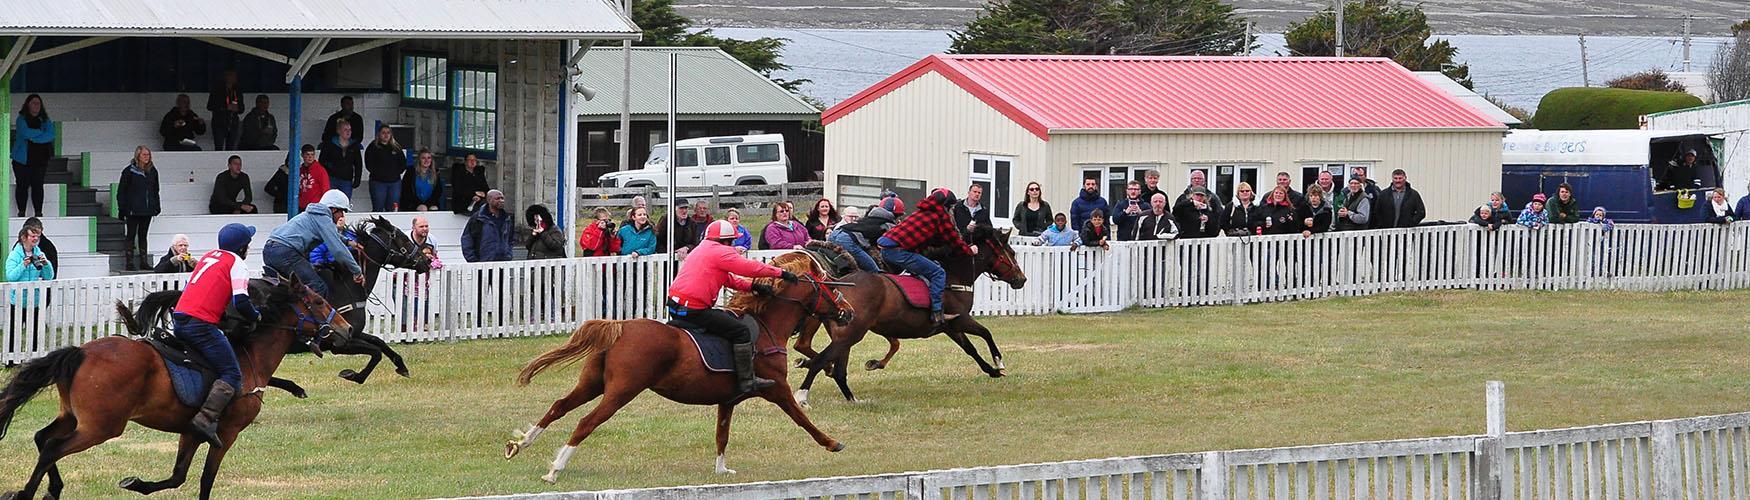 Christmas races at Stanley Racecourse, Falkland Islands